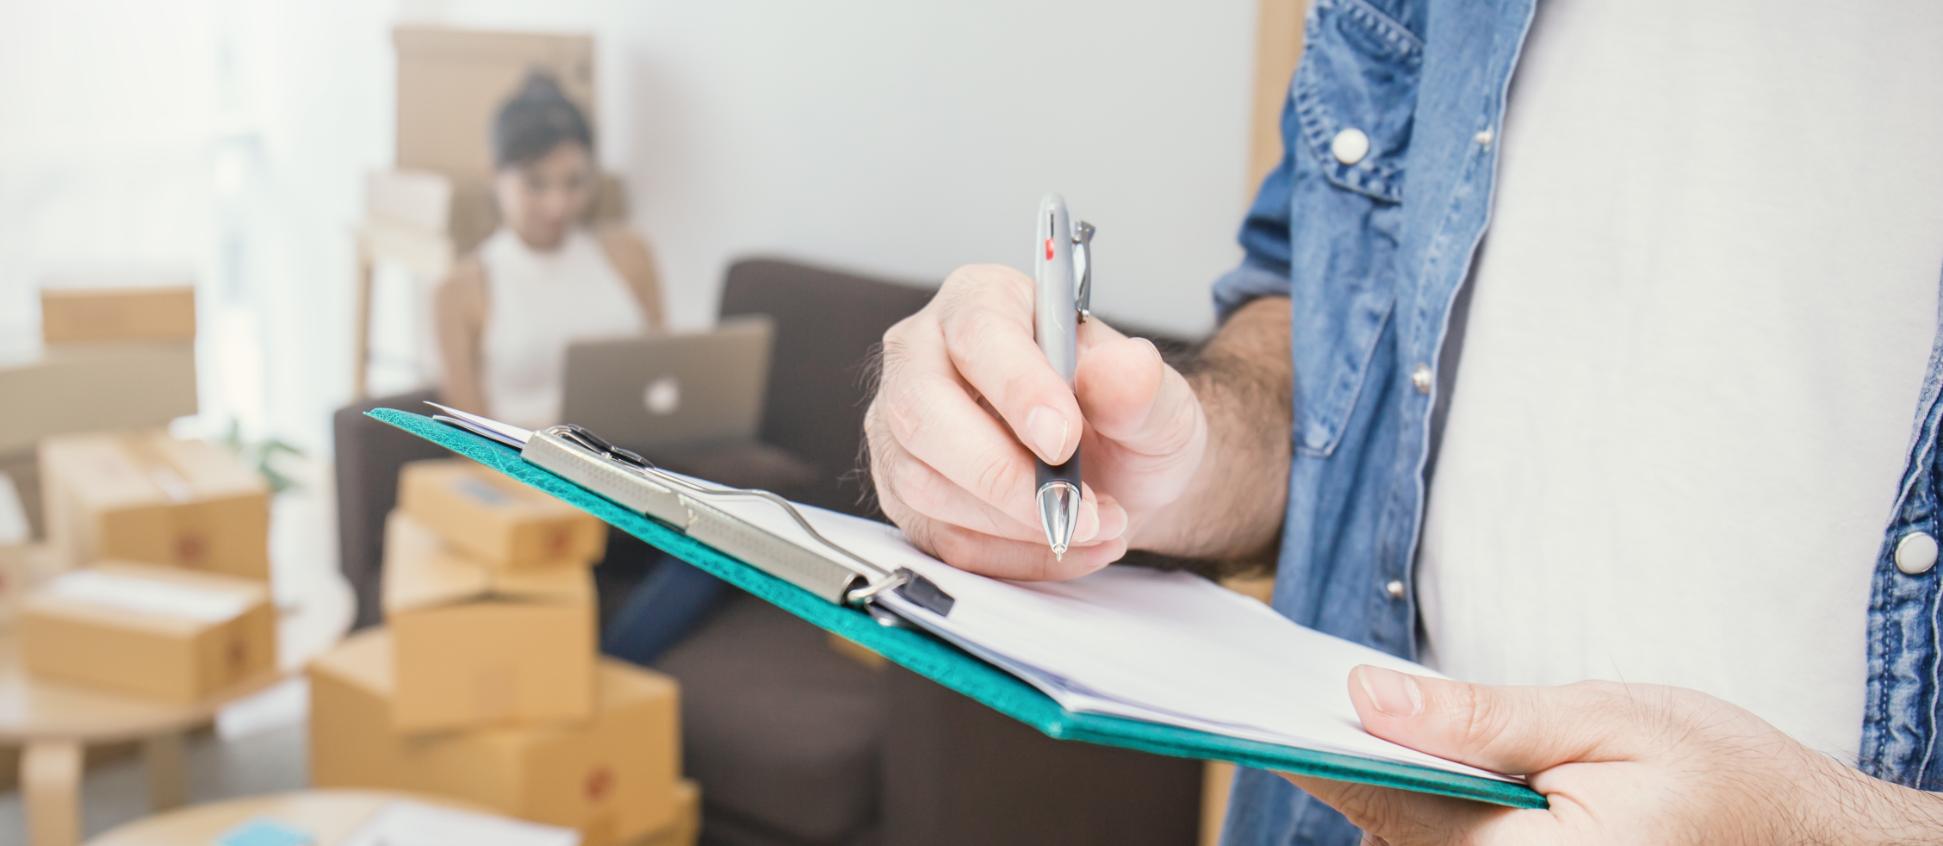 Writing on clipboard